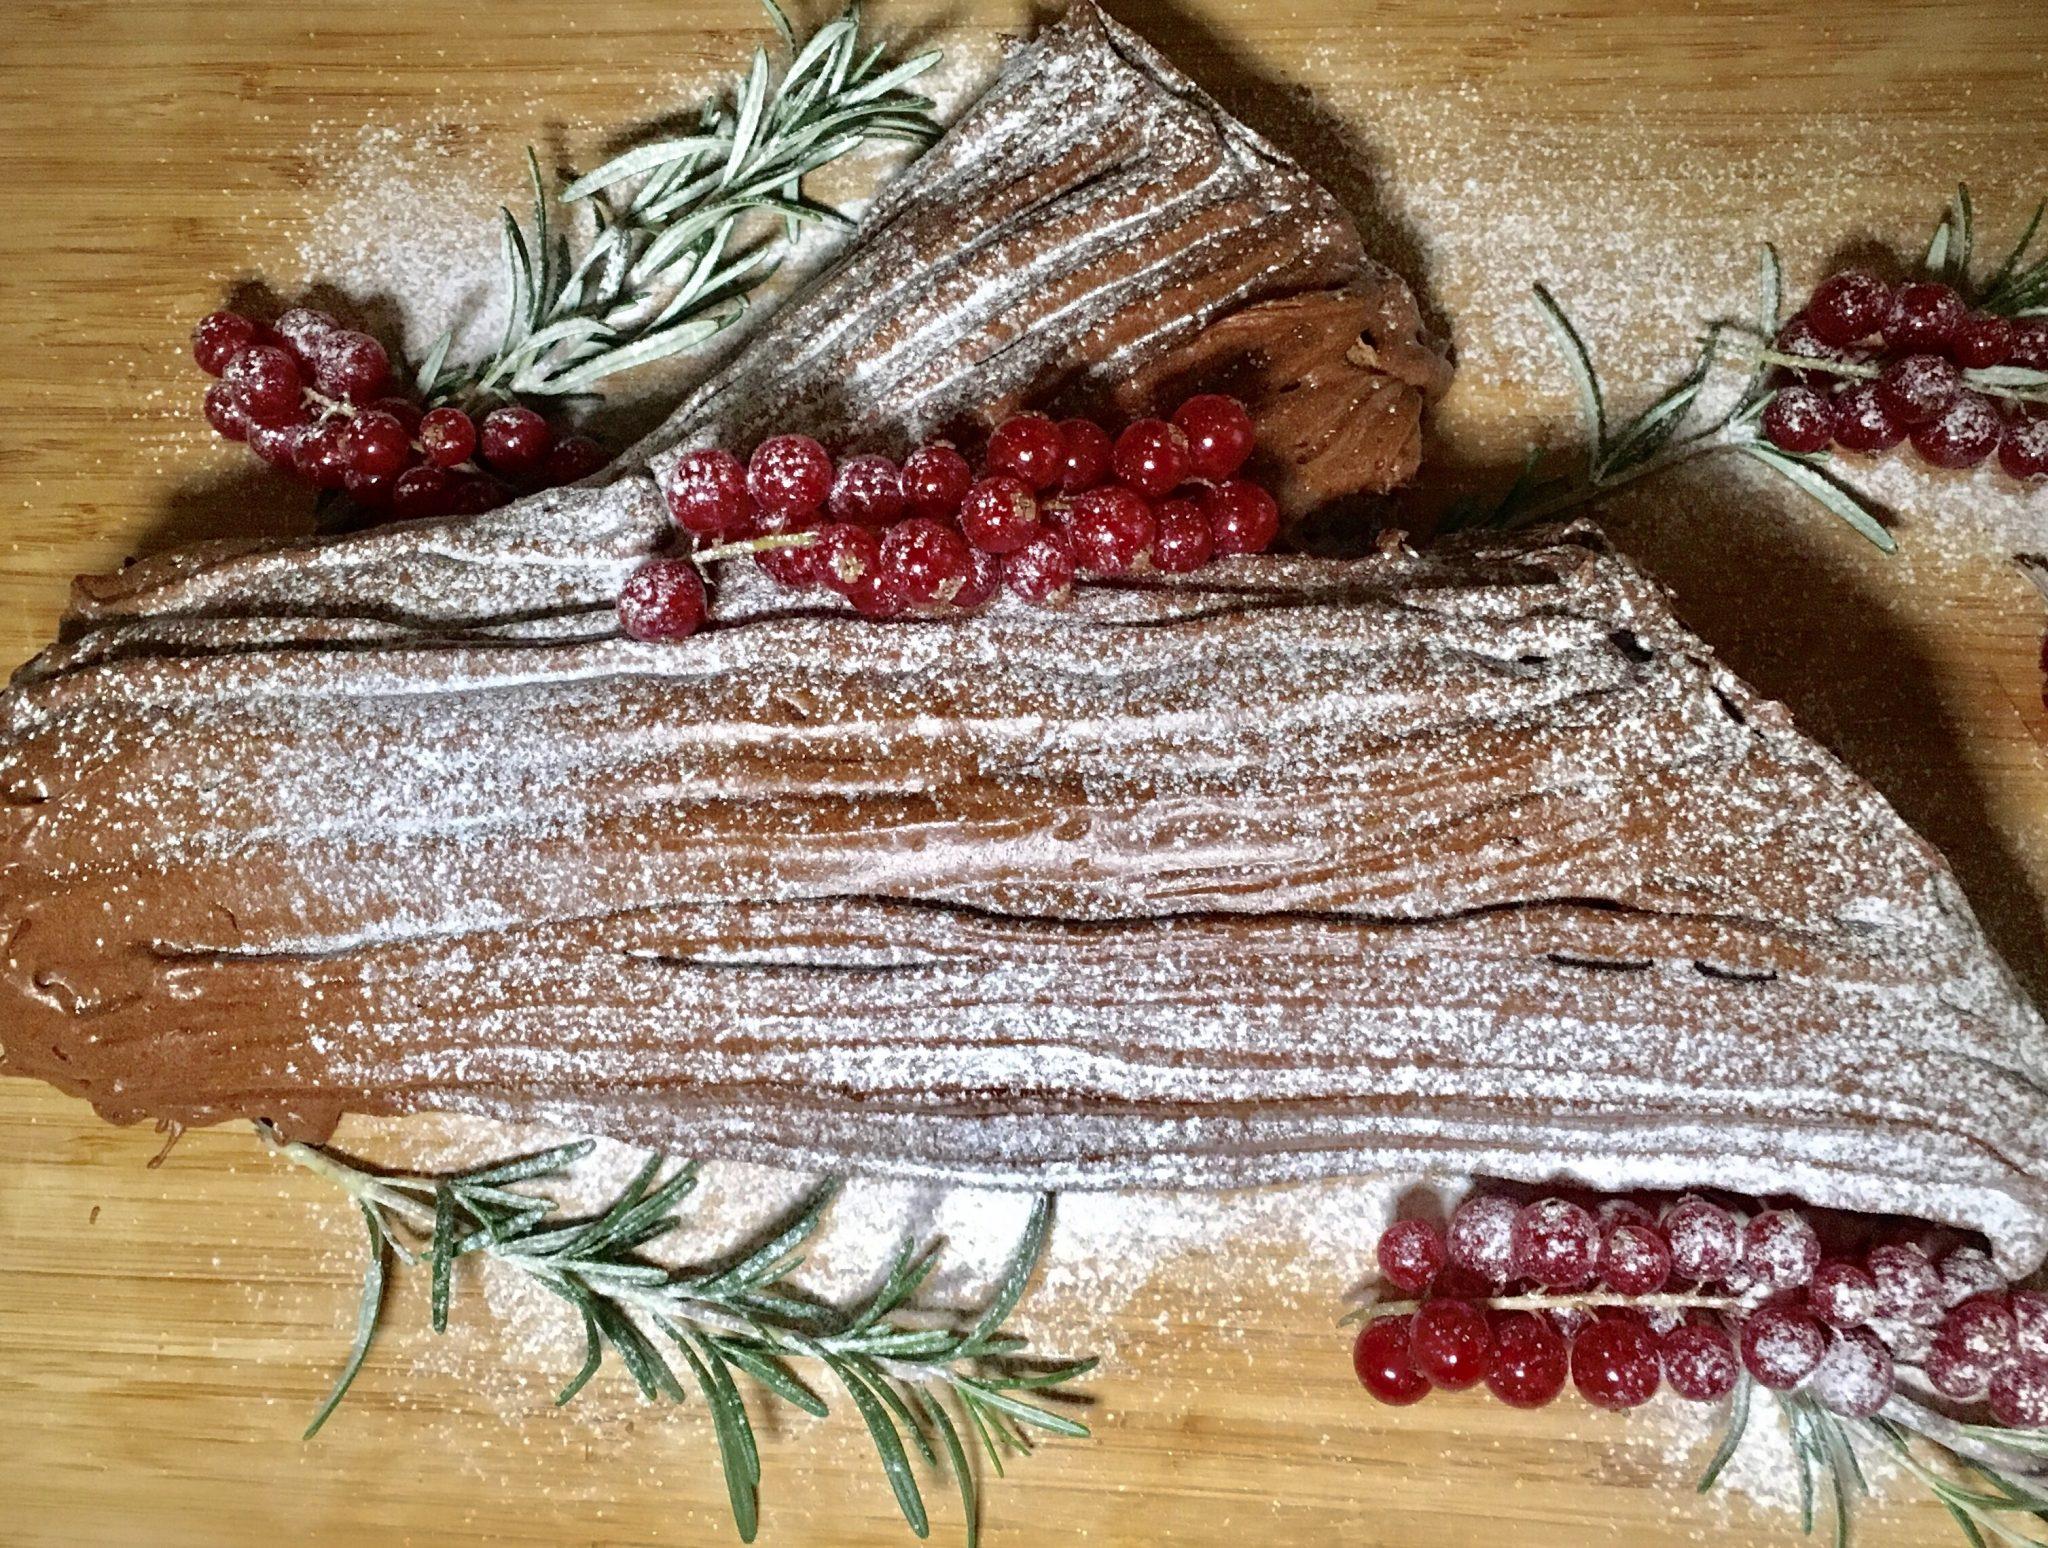 soofoodies chocolate log dessert